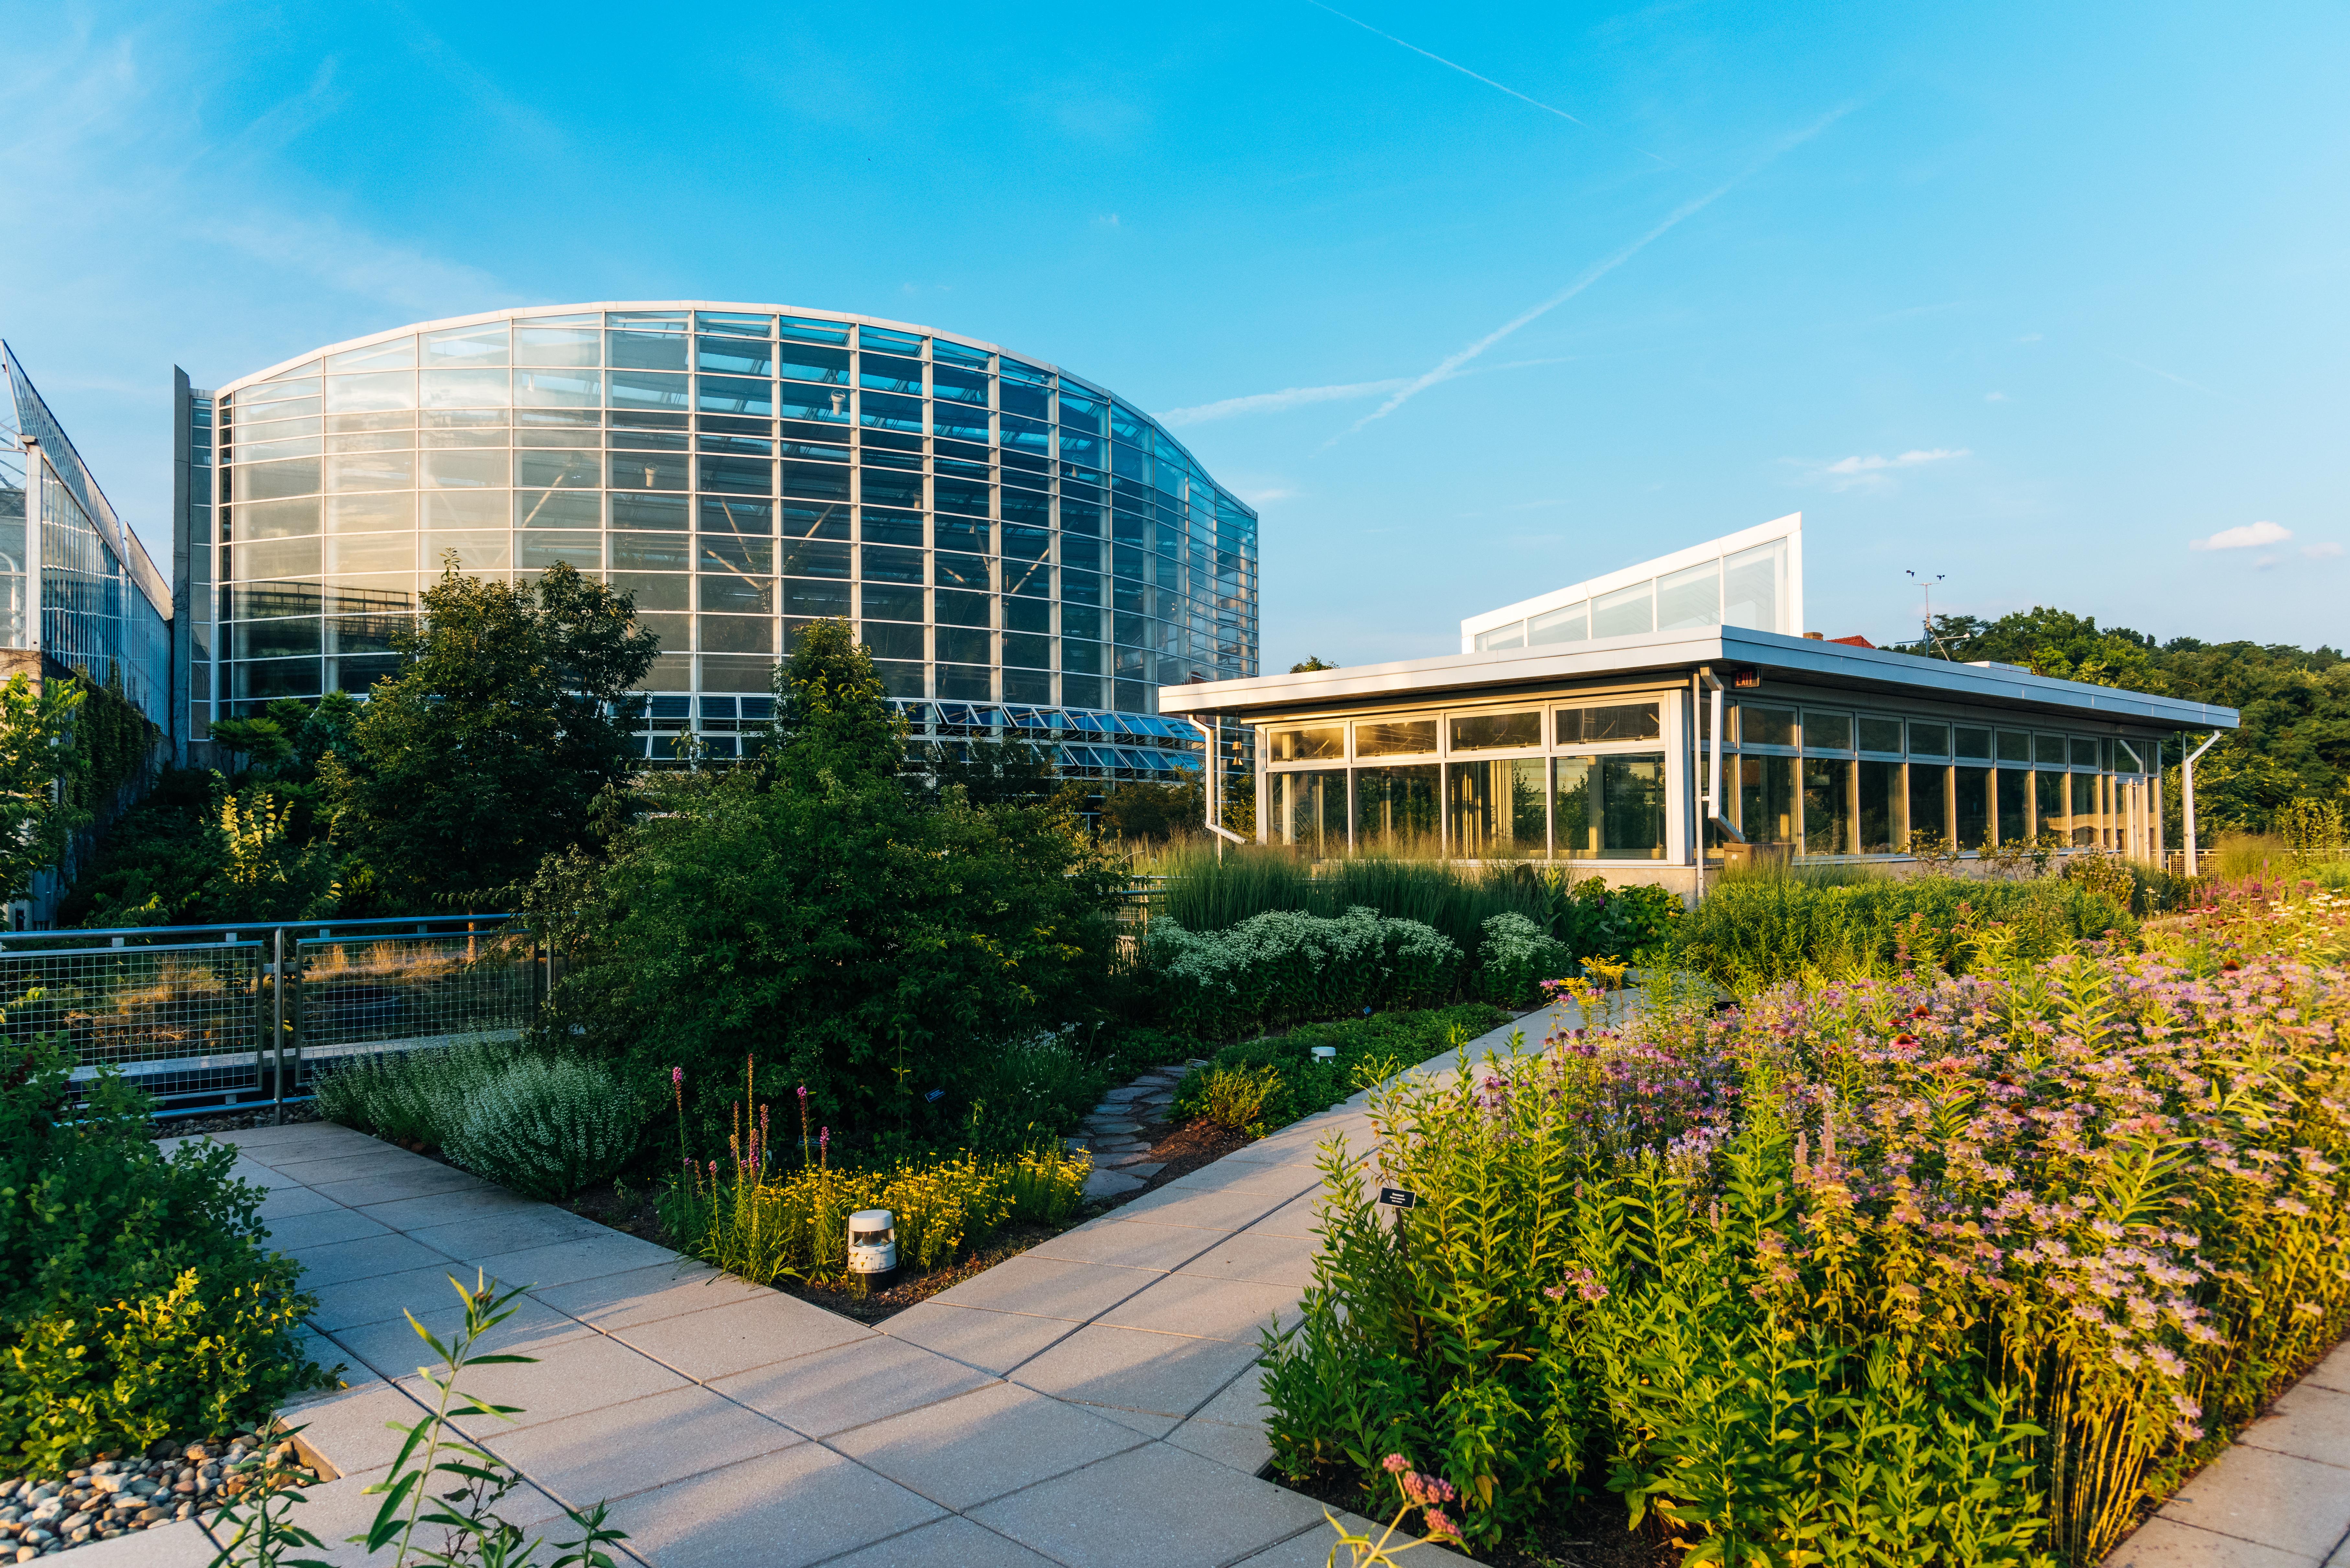 qz.com - Karen Hao - Pittsburgh's 'living building' focuses on eco-friendly construction